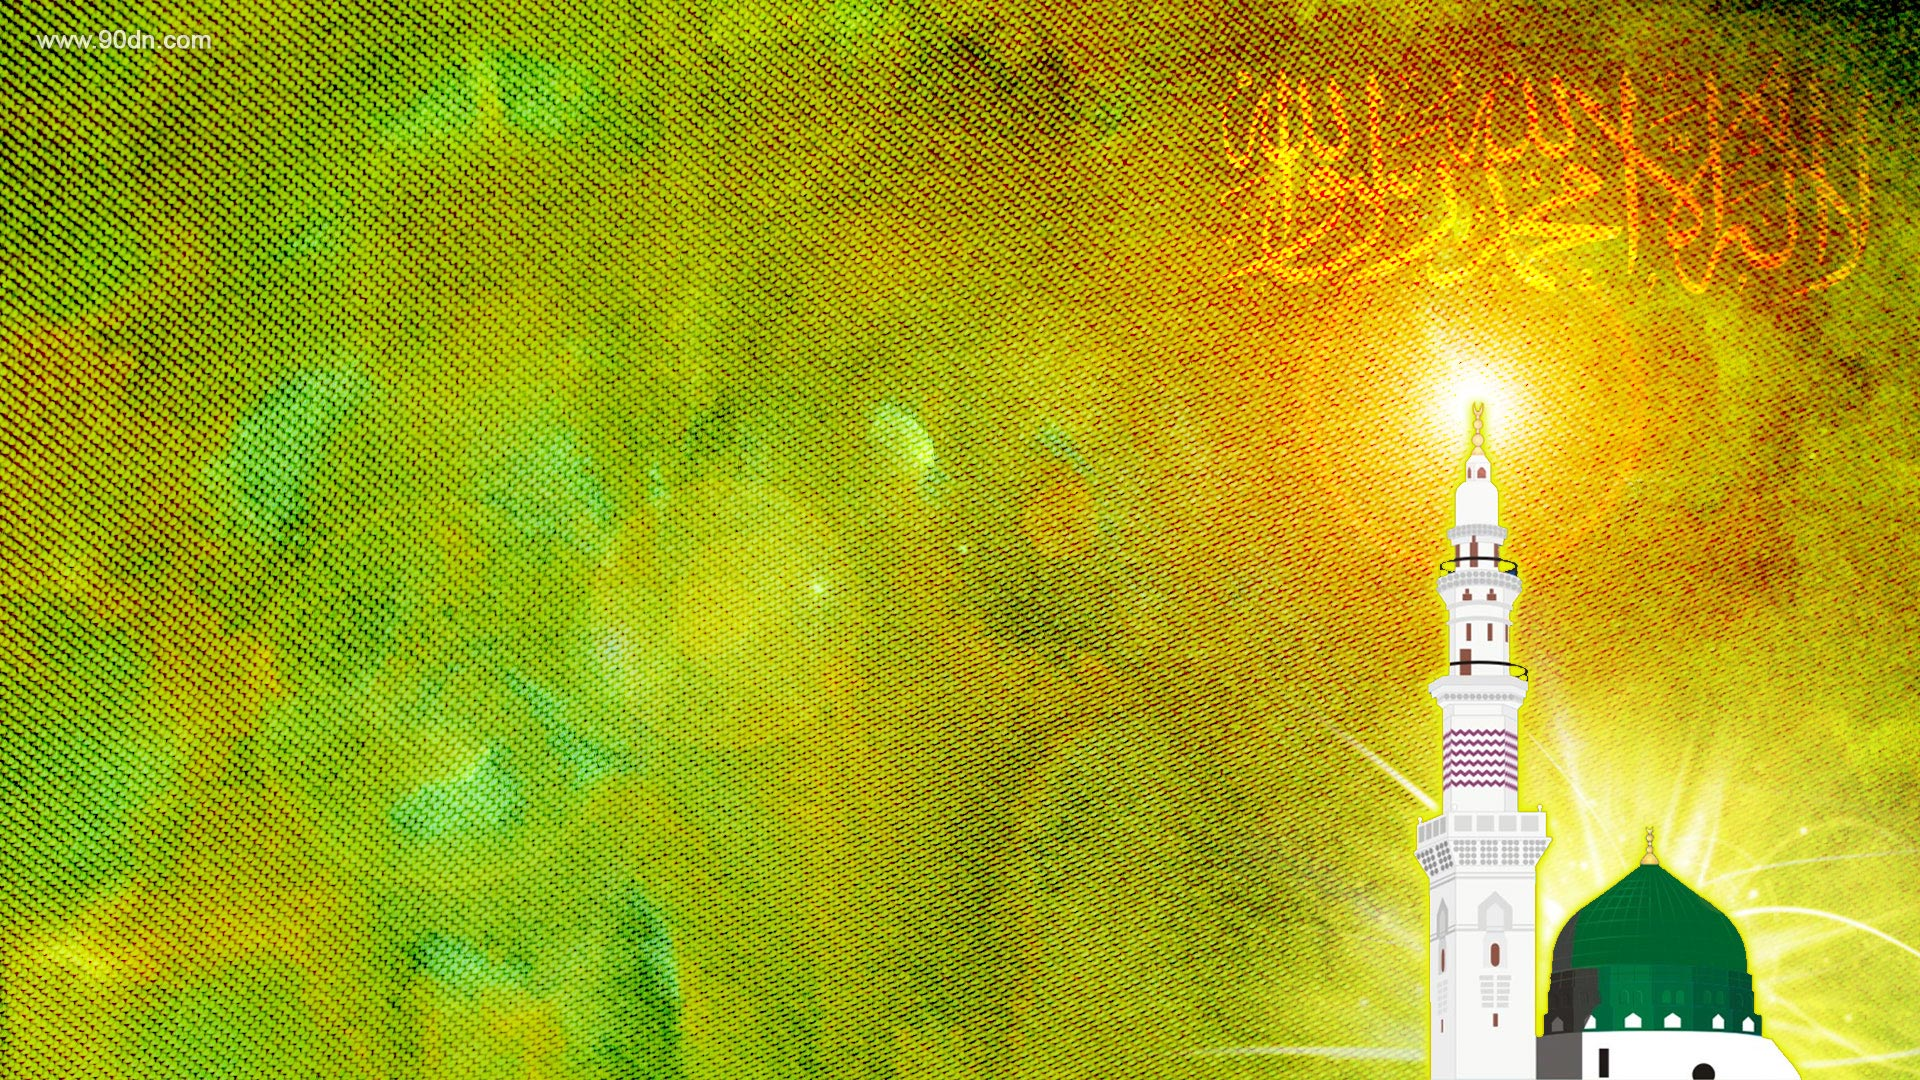 Islamic Wallpaper Background HD 1920x1080